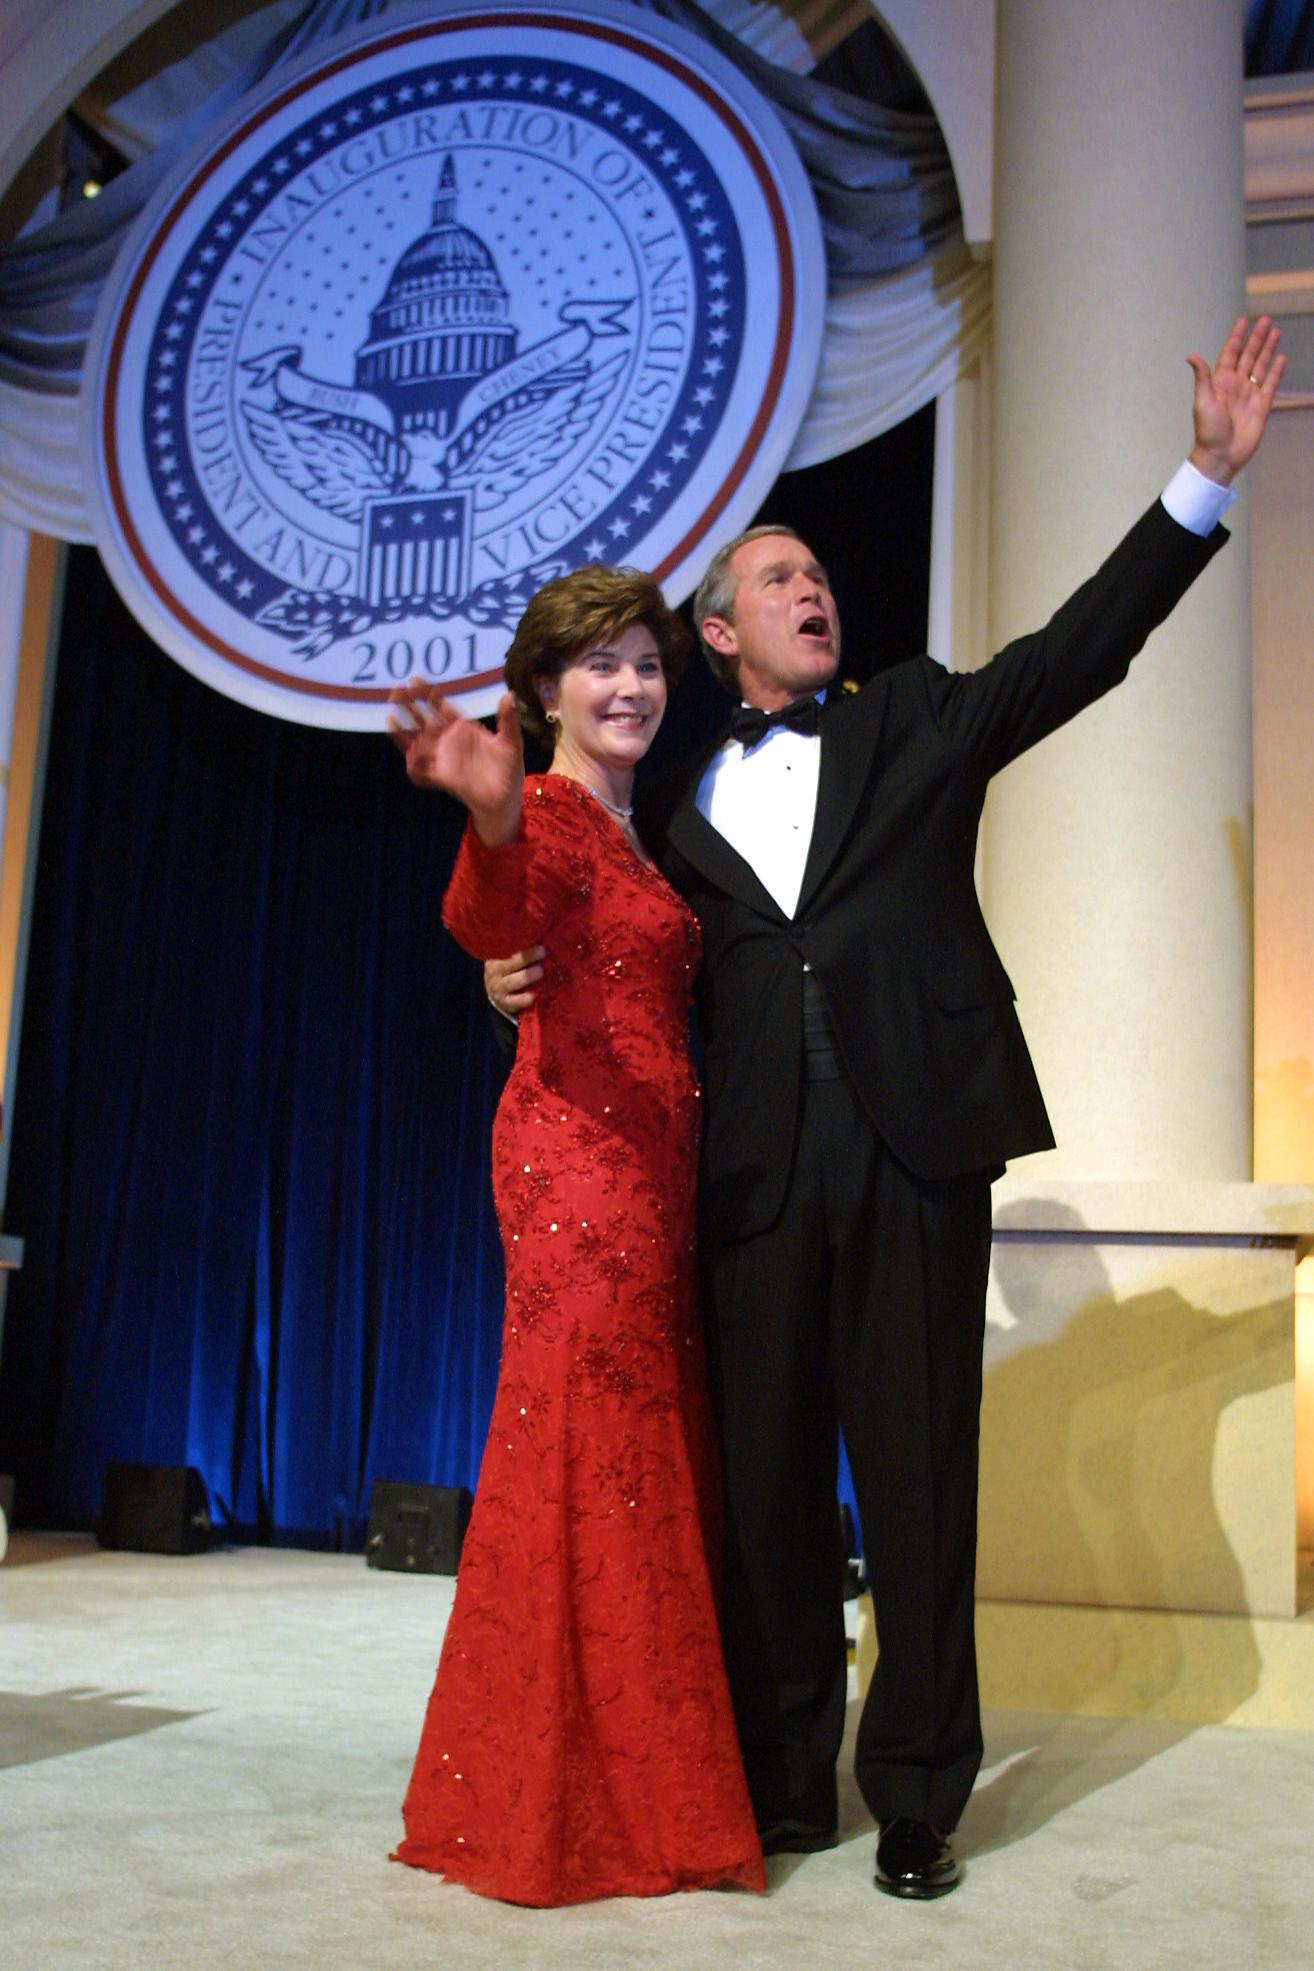 Джордж Буш и Лора Буш в платье Michael Faircloth, инаугурационный бал, 2001 год